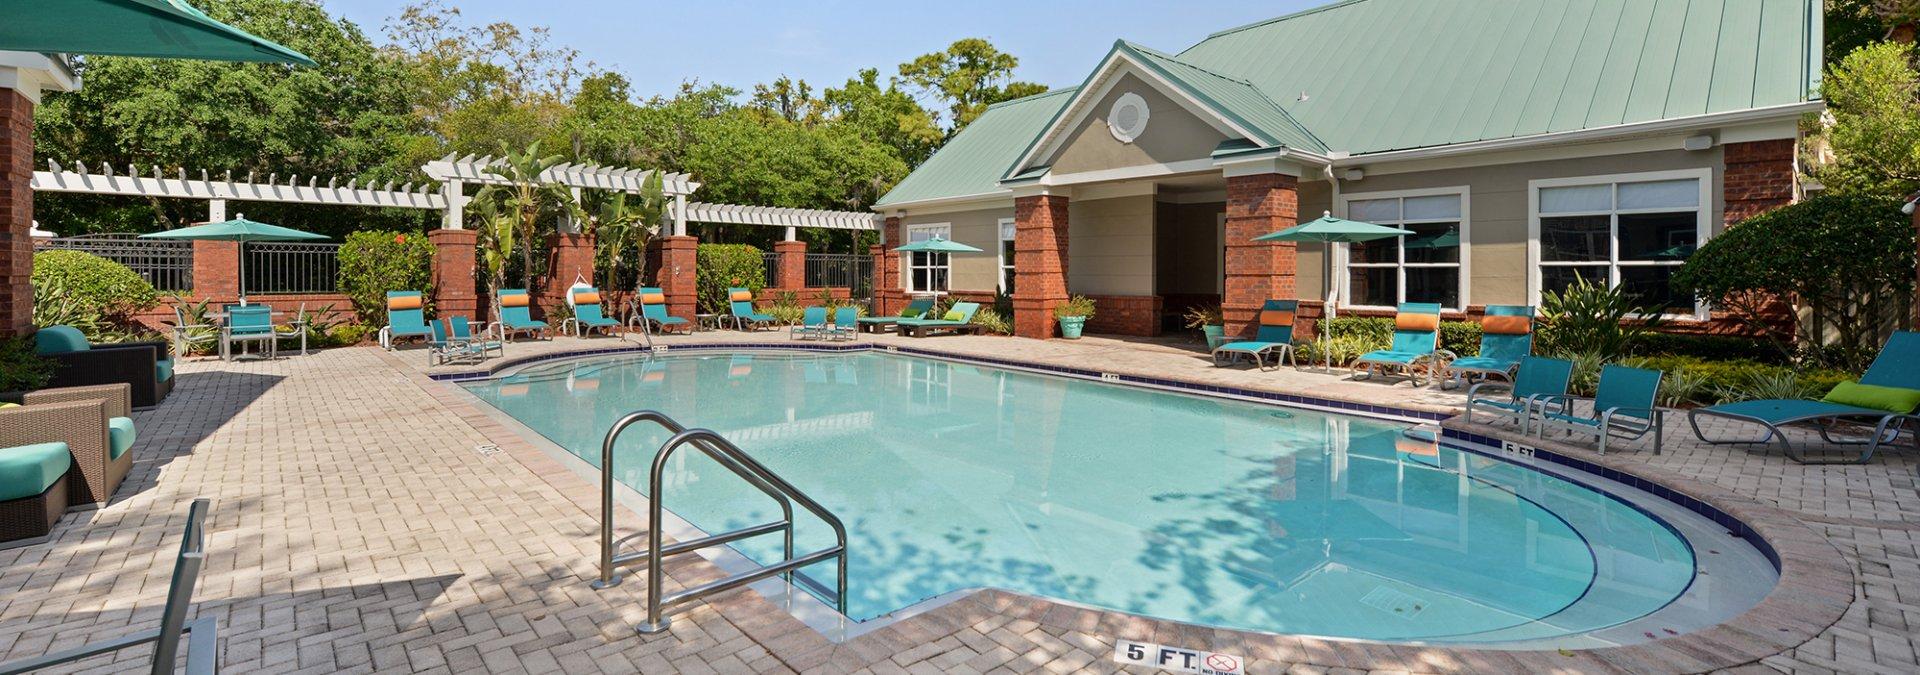 Resort Style Pool | Apartments Near USF | The Social at South Florida